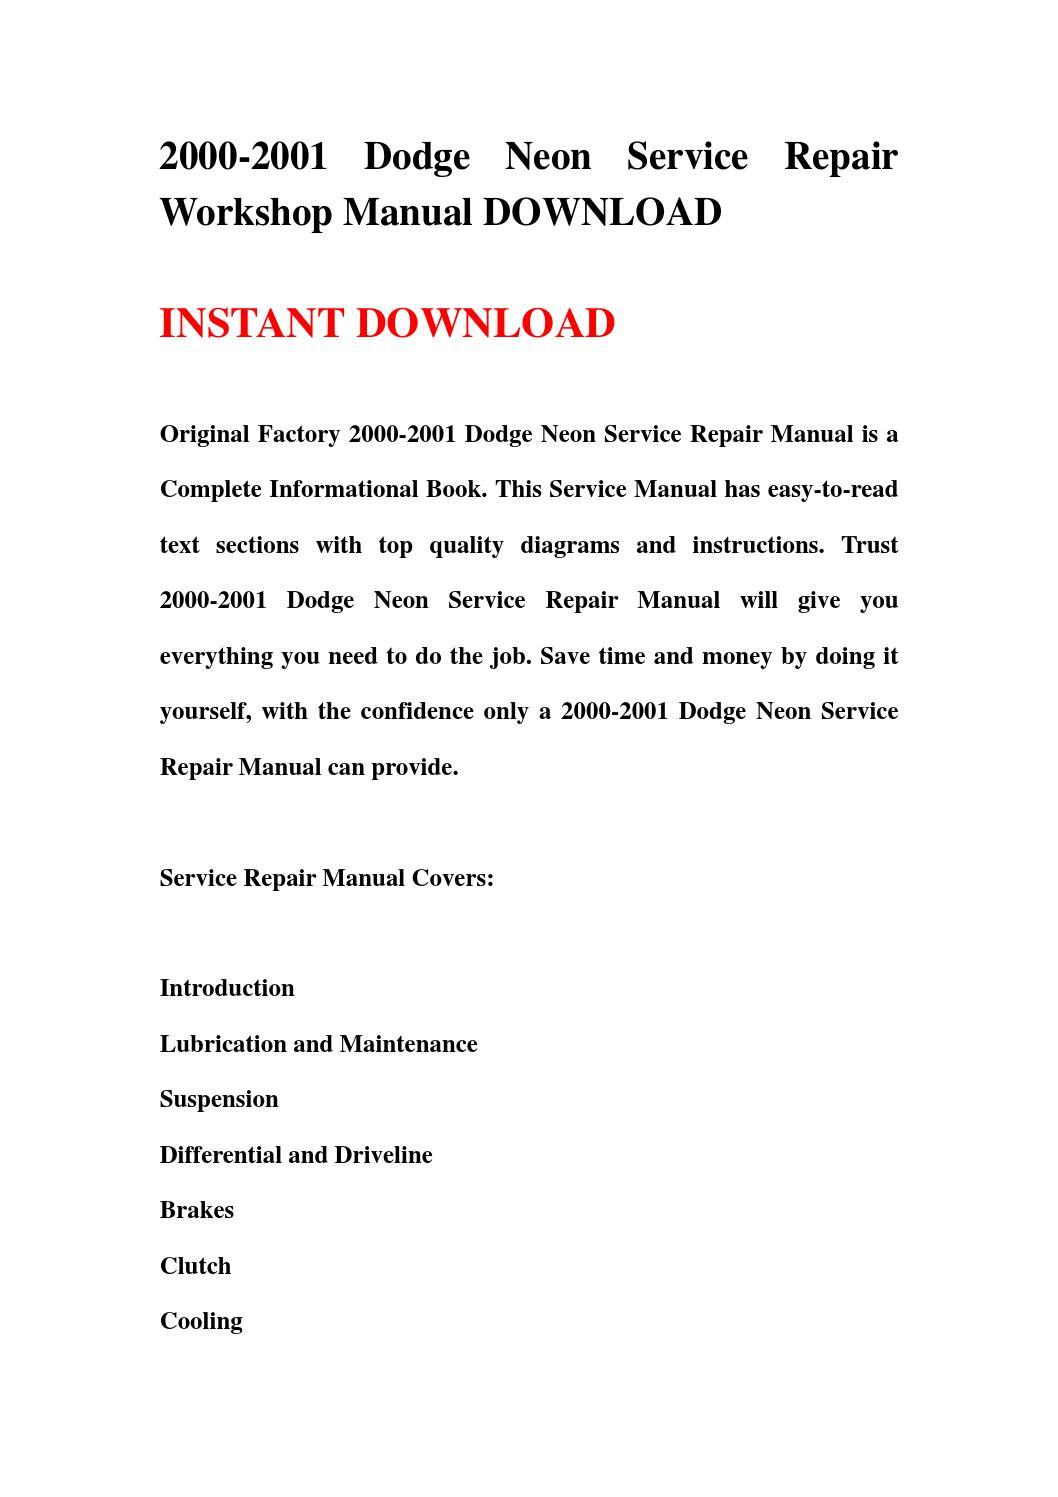 2000 2001 dodge neon service repair workshop manual download by sefes -  issuu